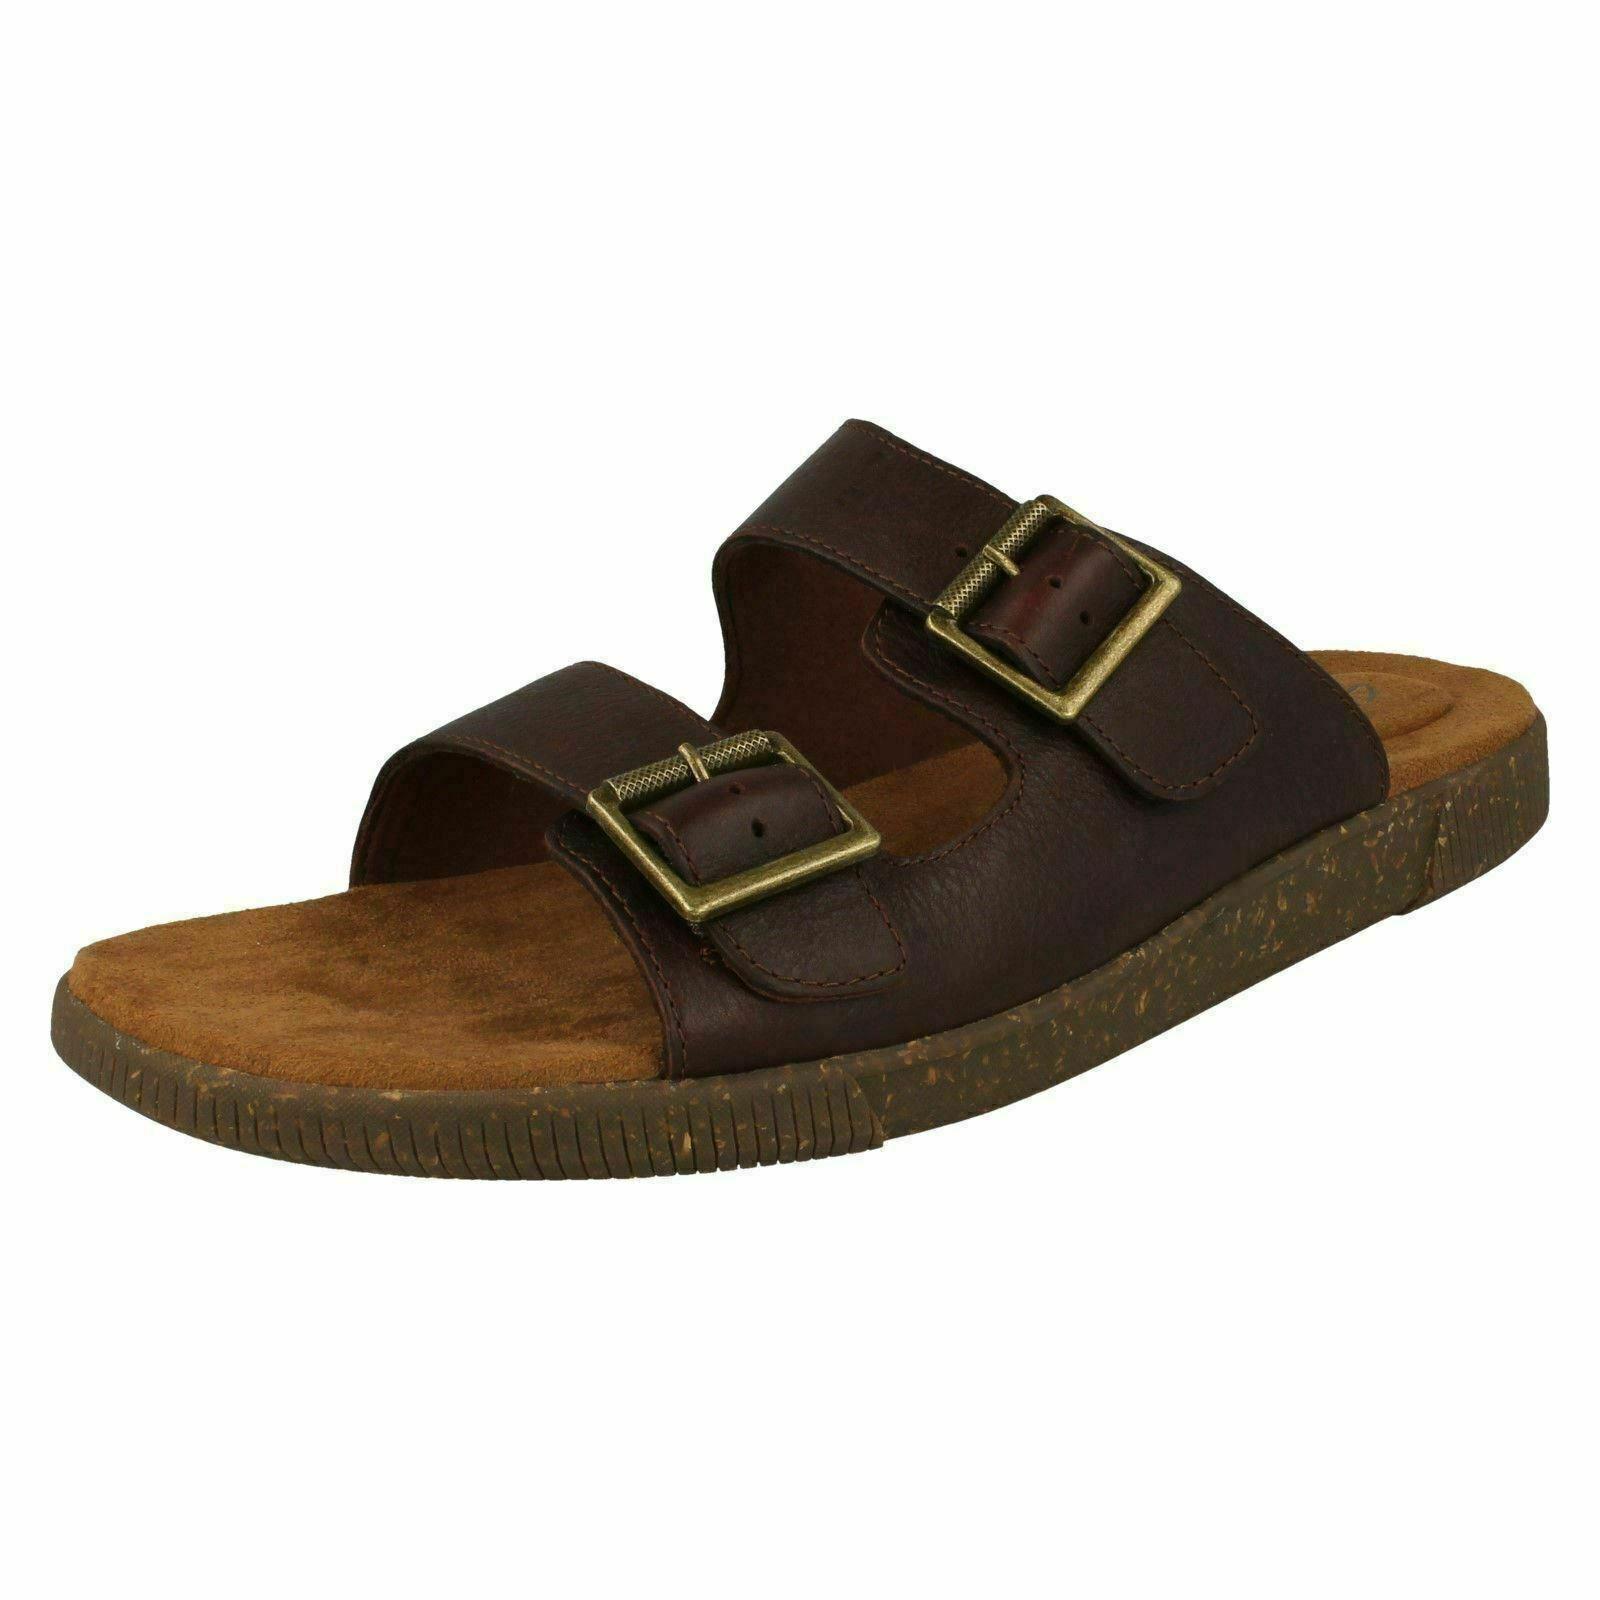 Mens Clarks Vine Cedar Leather Mule Sandals